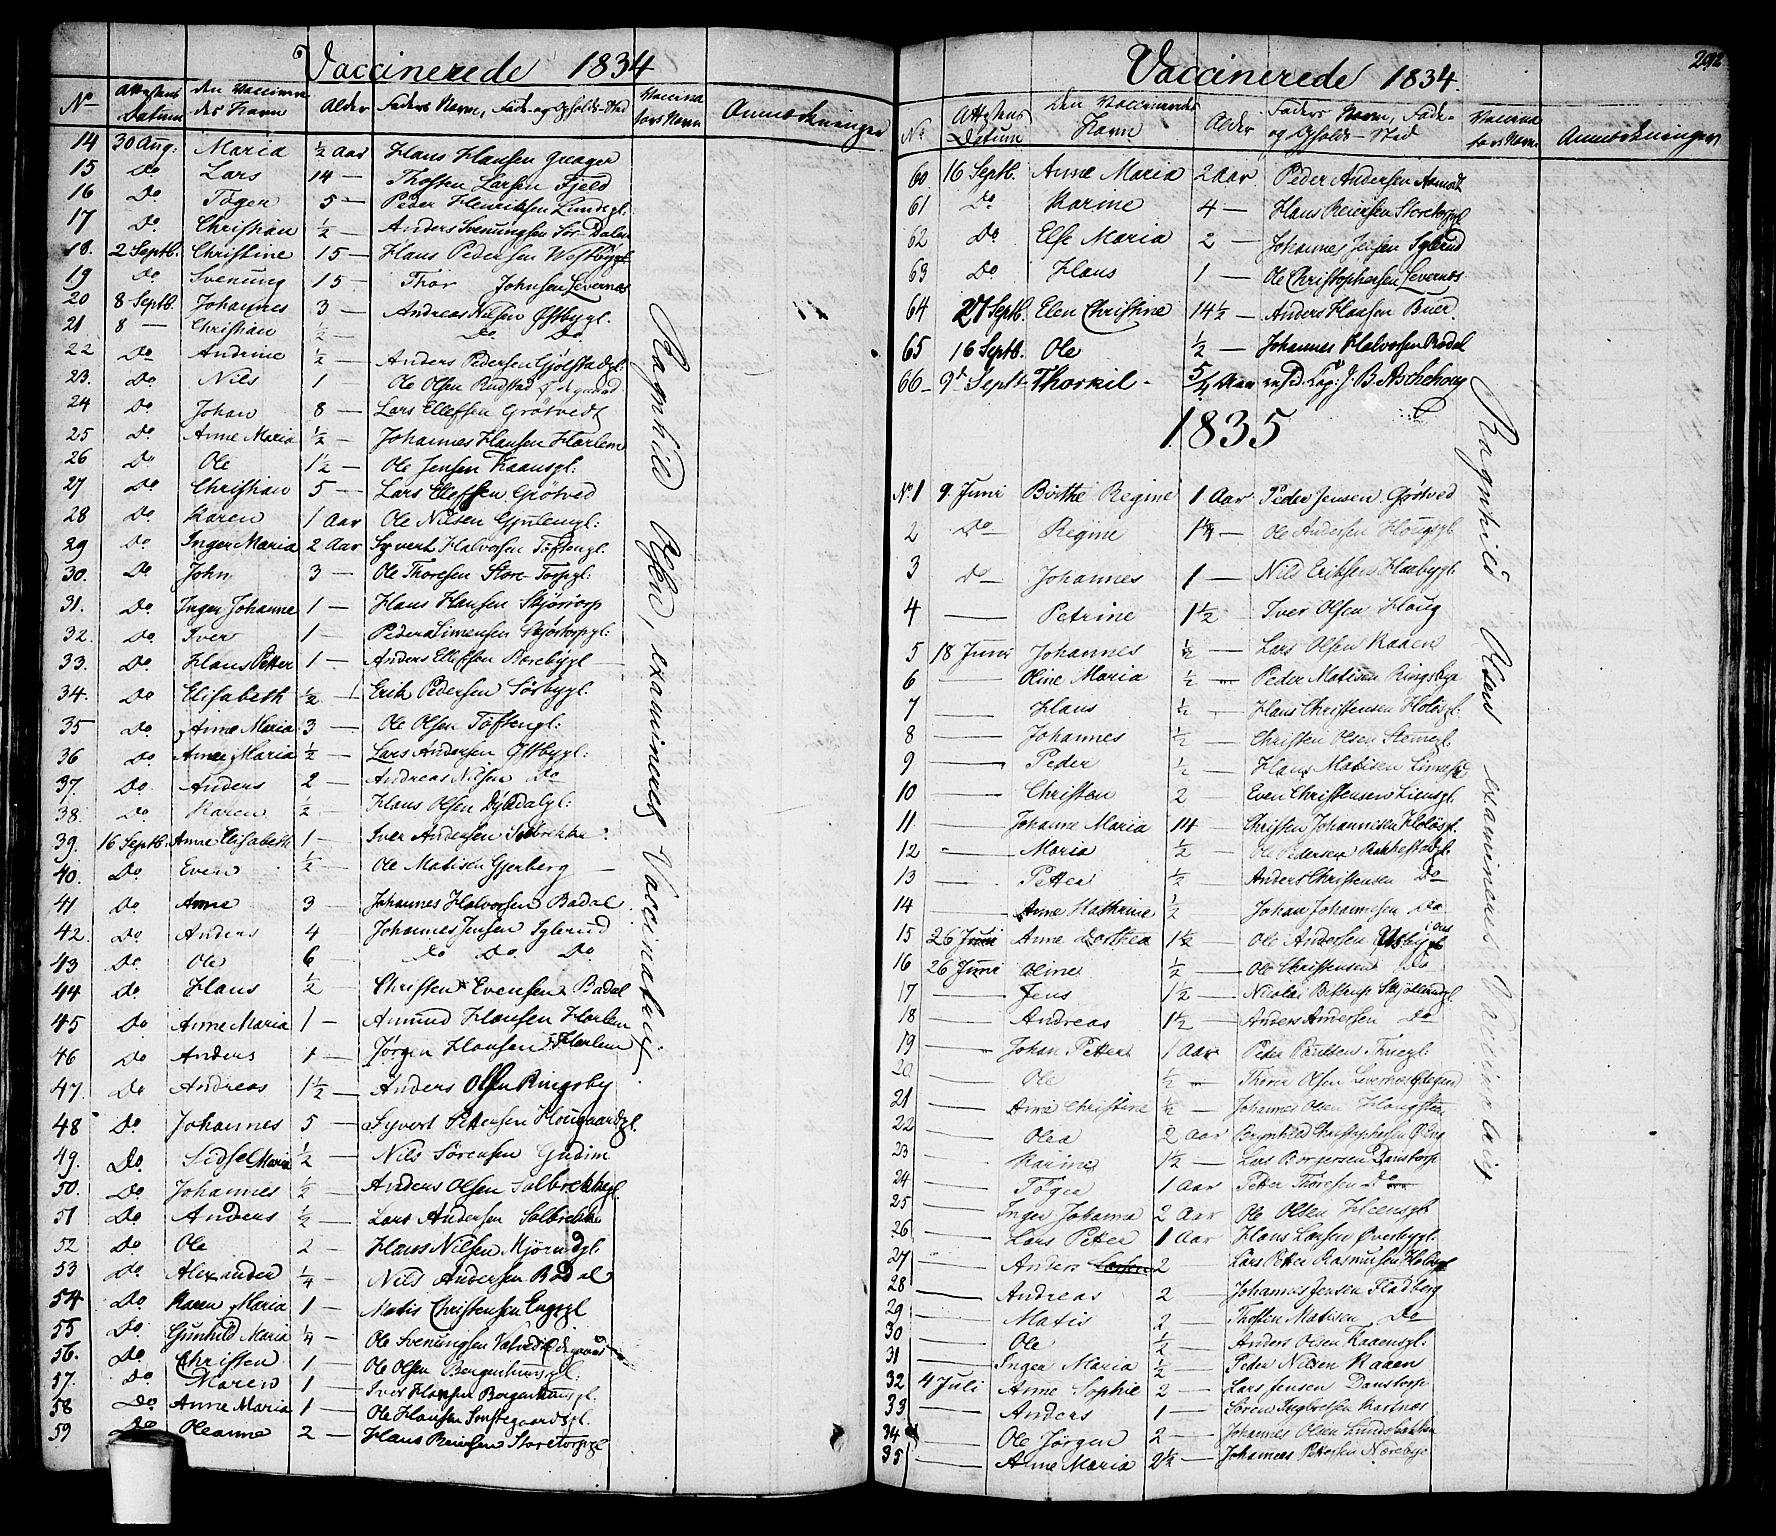 SAO, Rakkestad prestekontor Kirkebøker, F/Fa/L0007: Ministerialbok nr. I 7, 1825-1841, s. 292